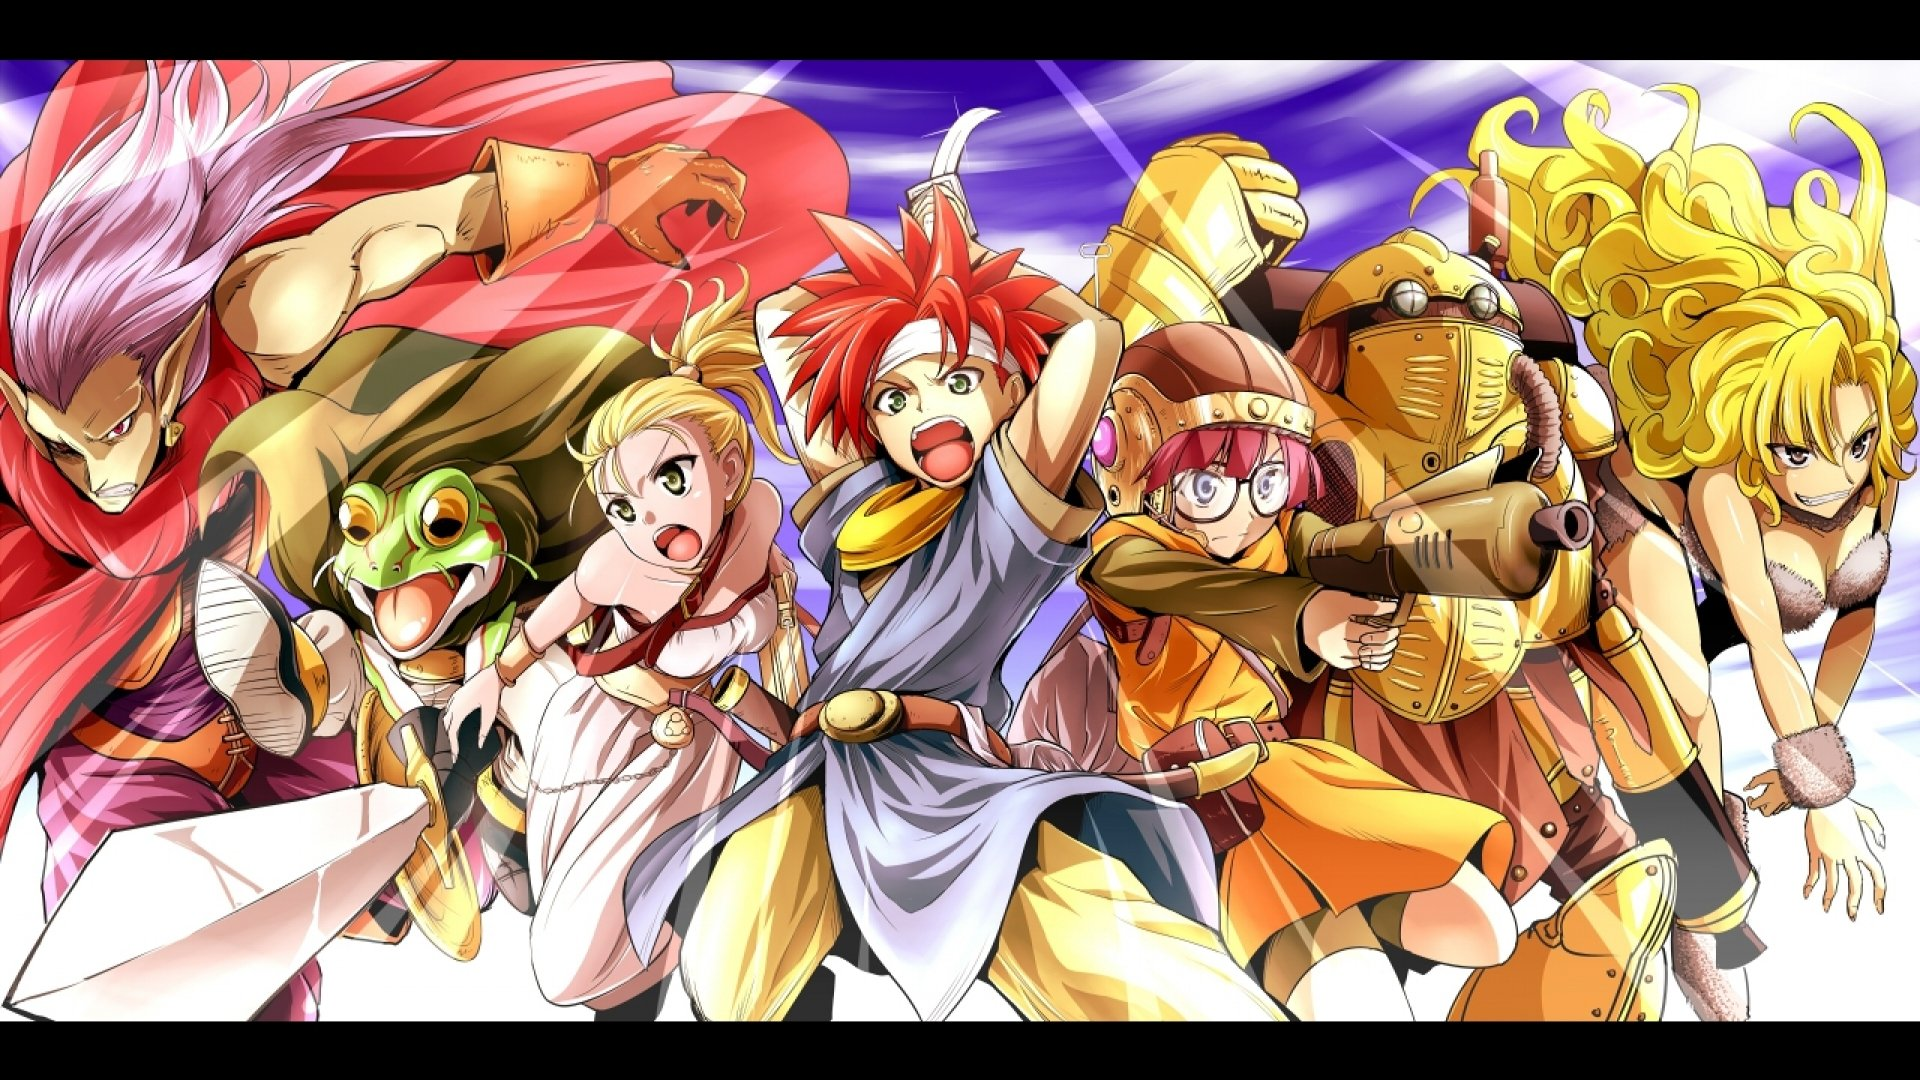 CHRONO TRIGGER rpg anime action fantasy wallpaper ...